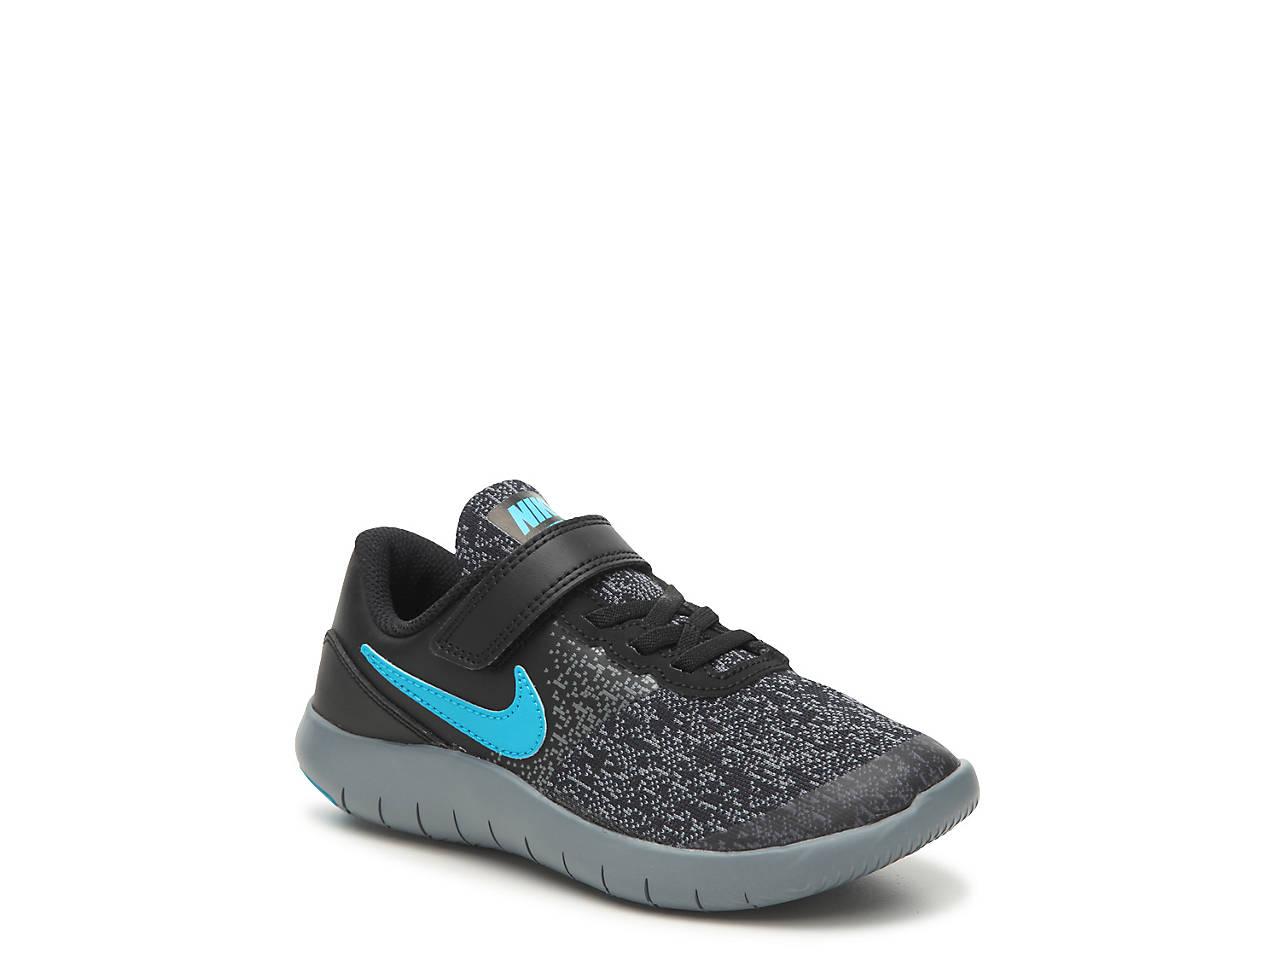 4d3305c68c57 Nike Flex Contact Toddler   Youth Running Shoe Kids Shoes